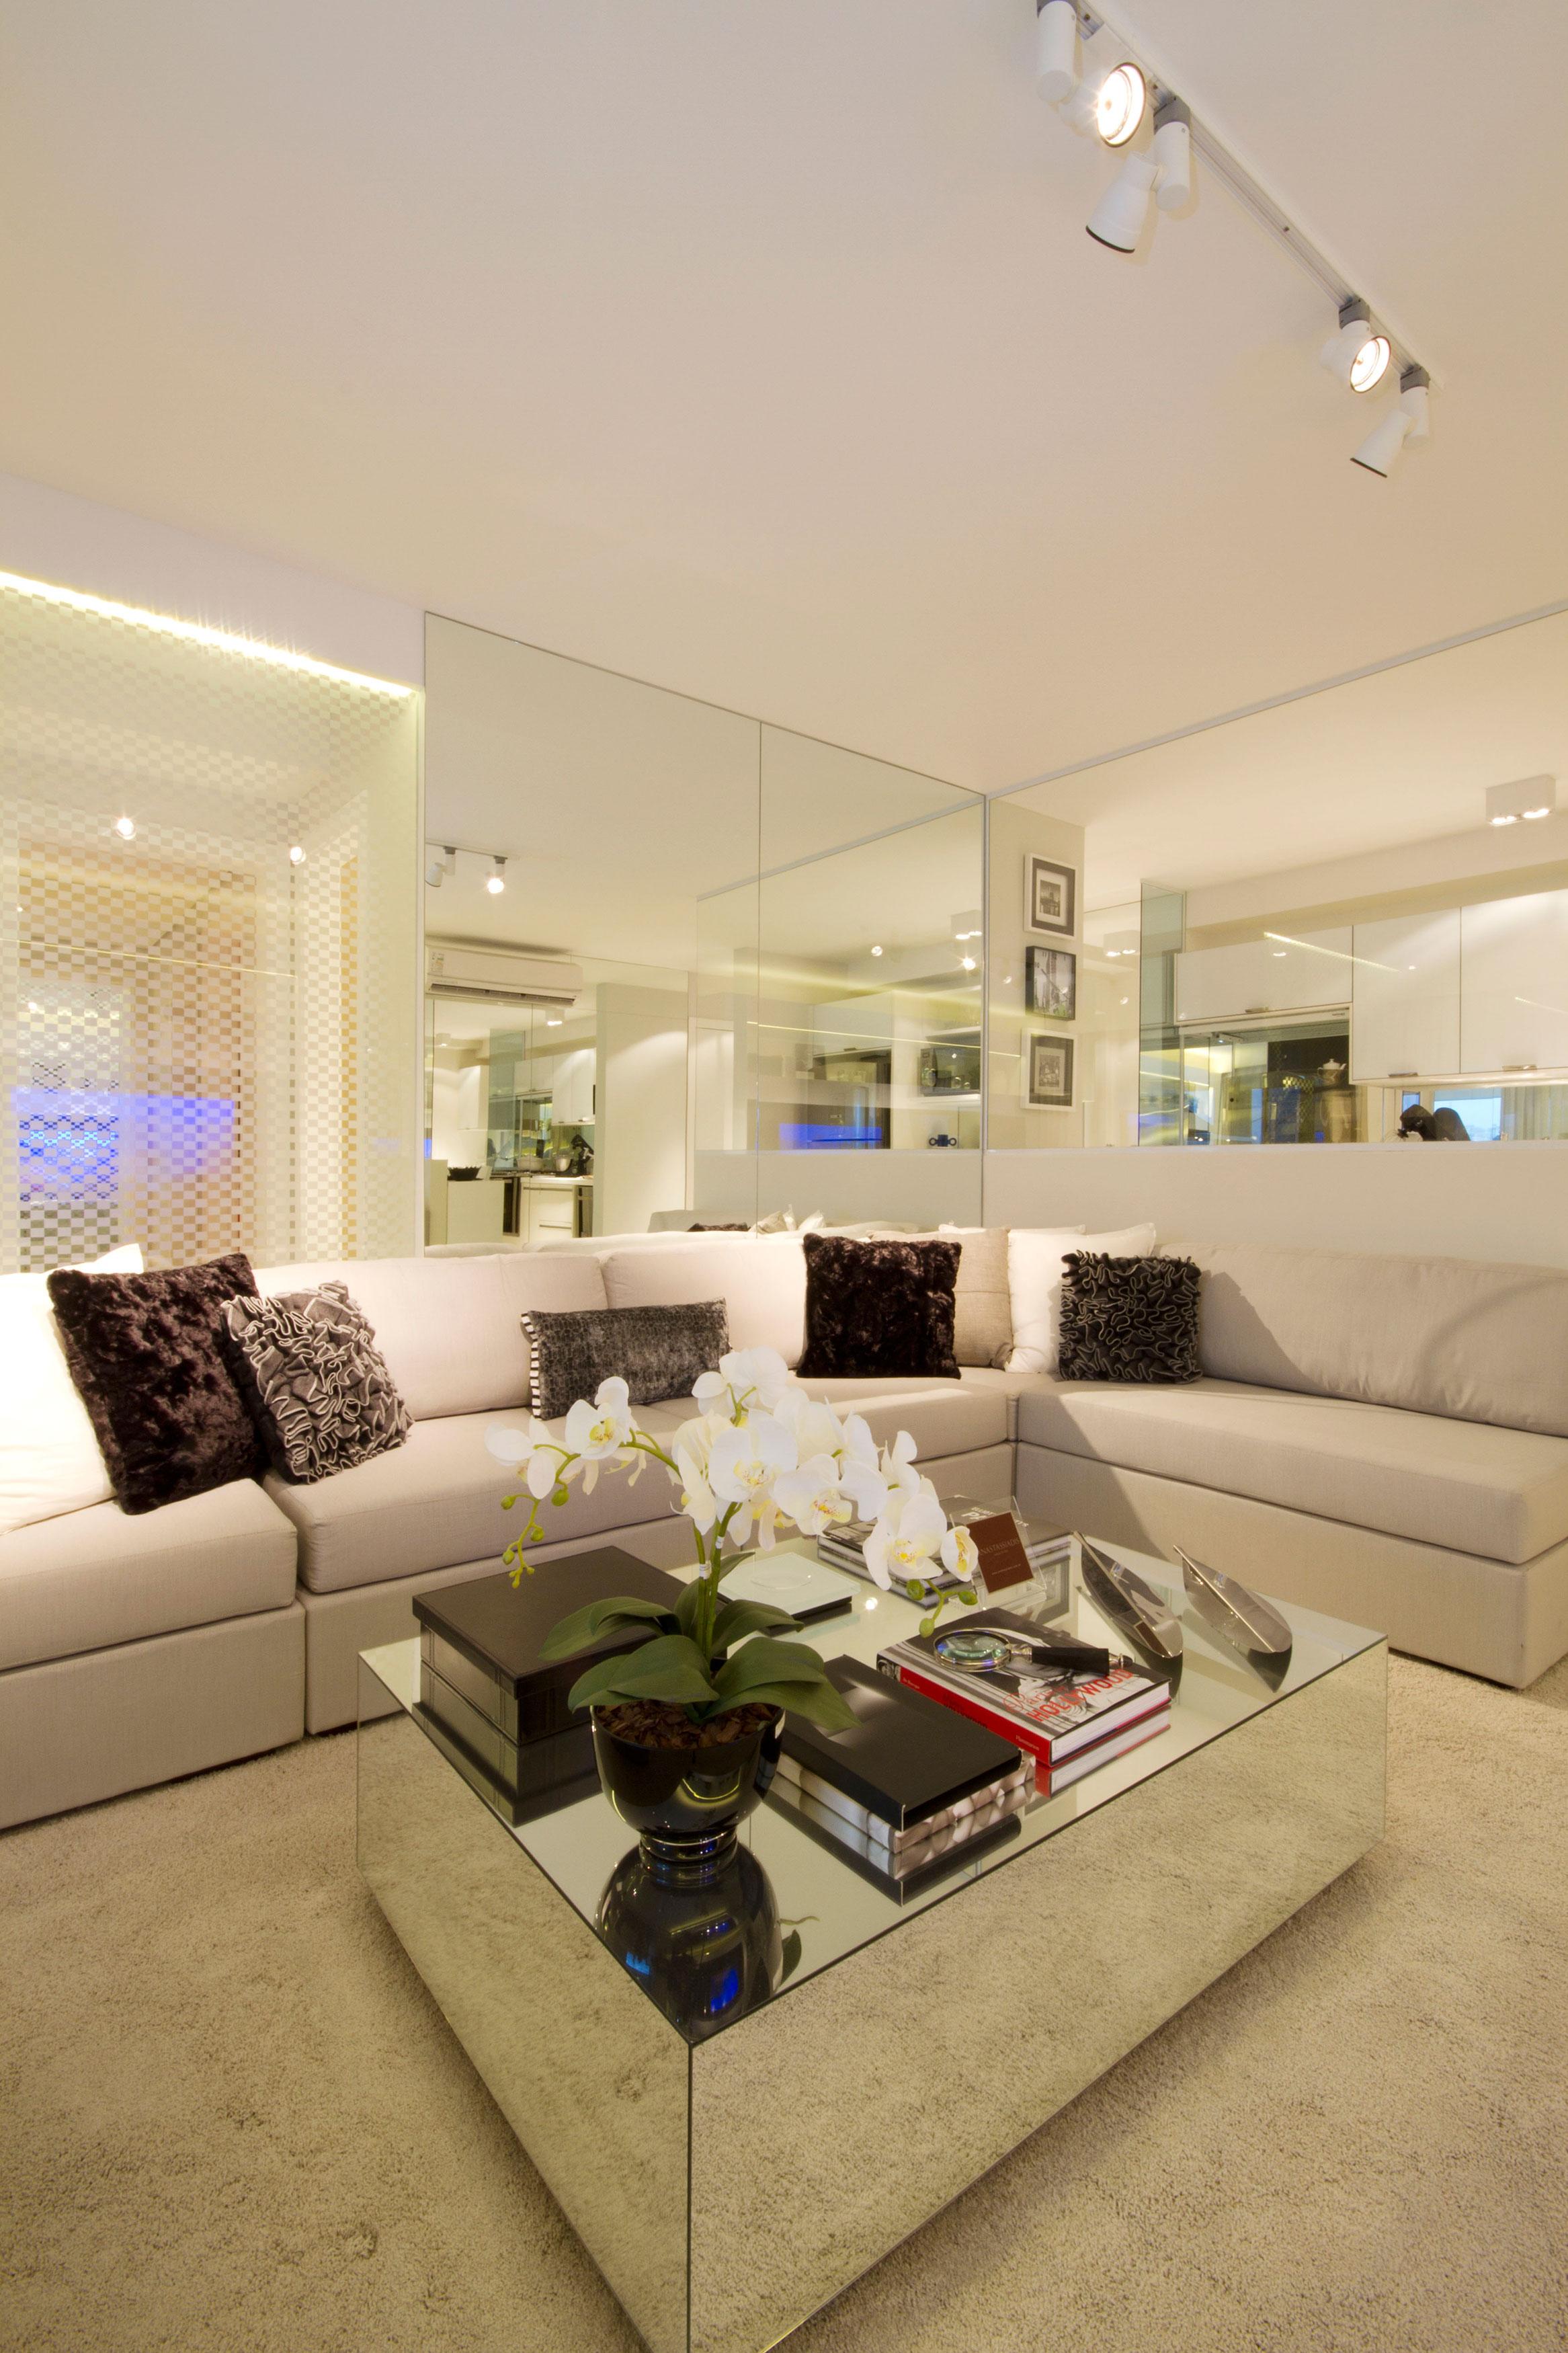 108 m² - Sala de estar